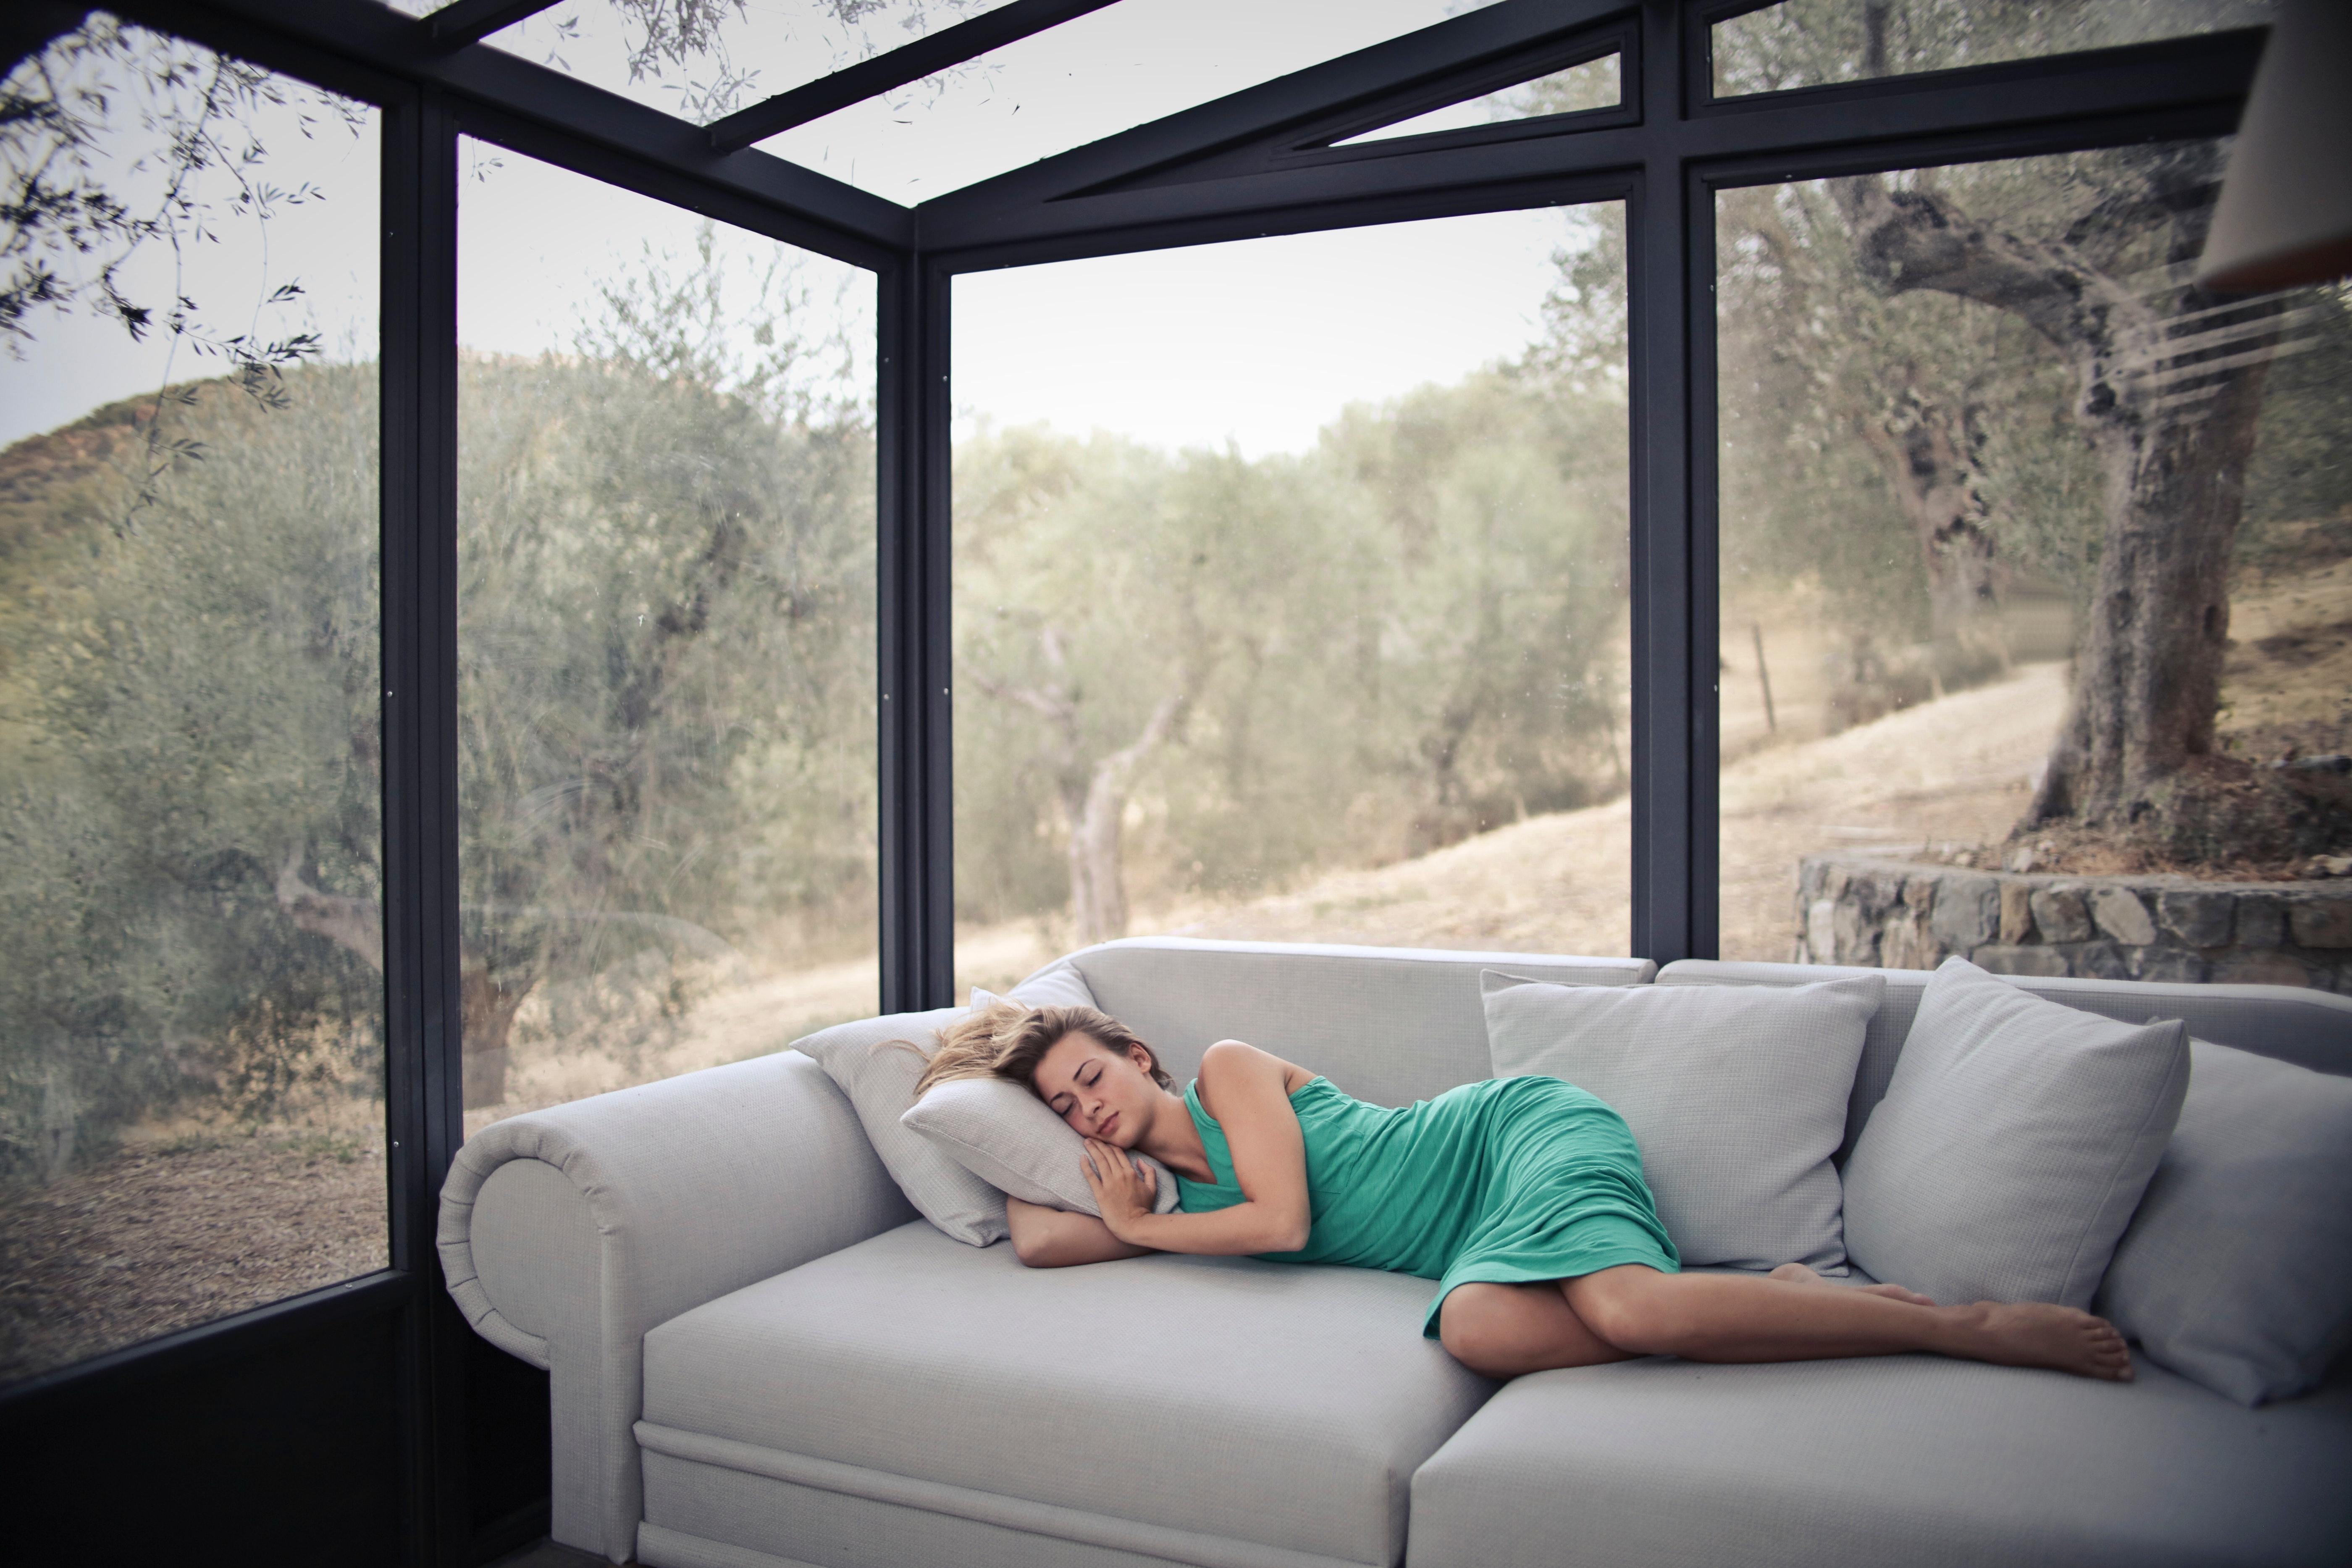 Woman Sleeping On Sofa With Throw Pillows, Relax, Window, Sofa, Sleeping, HQ Photo